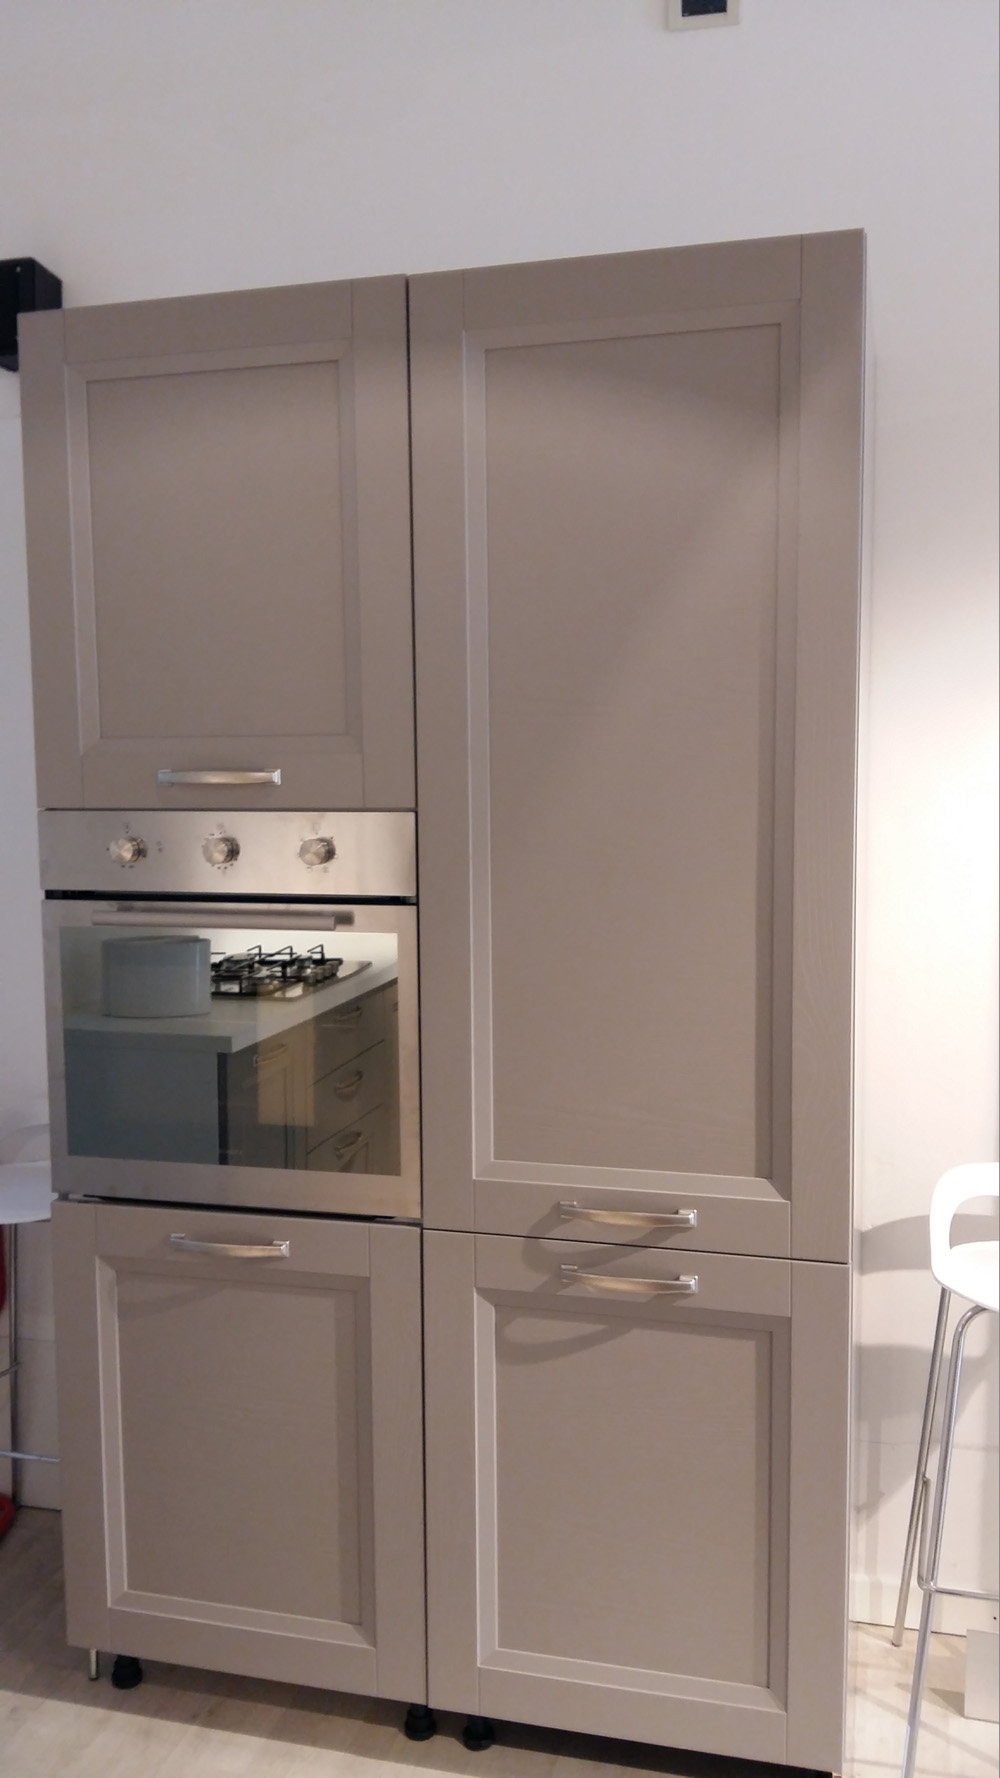 Cucina essebi cucine alba color platino e bianca moderno - Cucina bianca legno ...